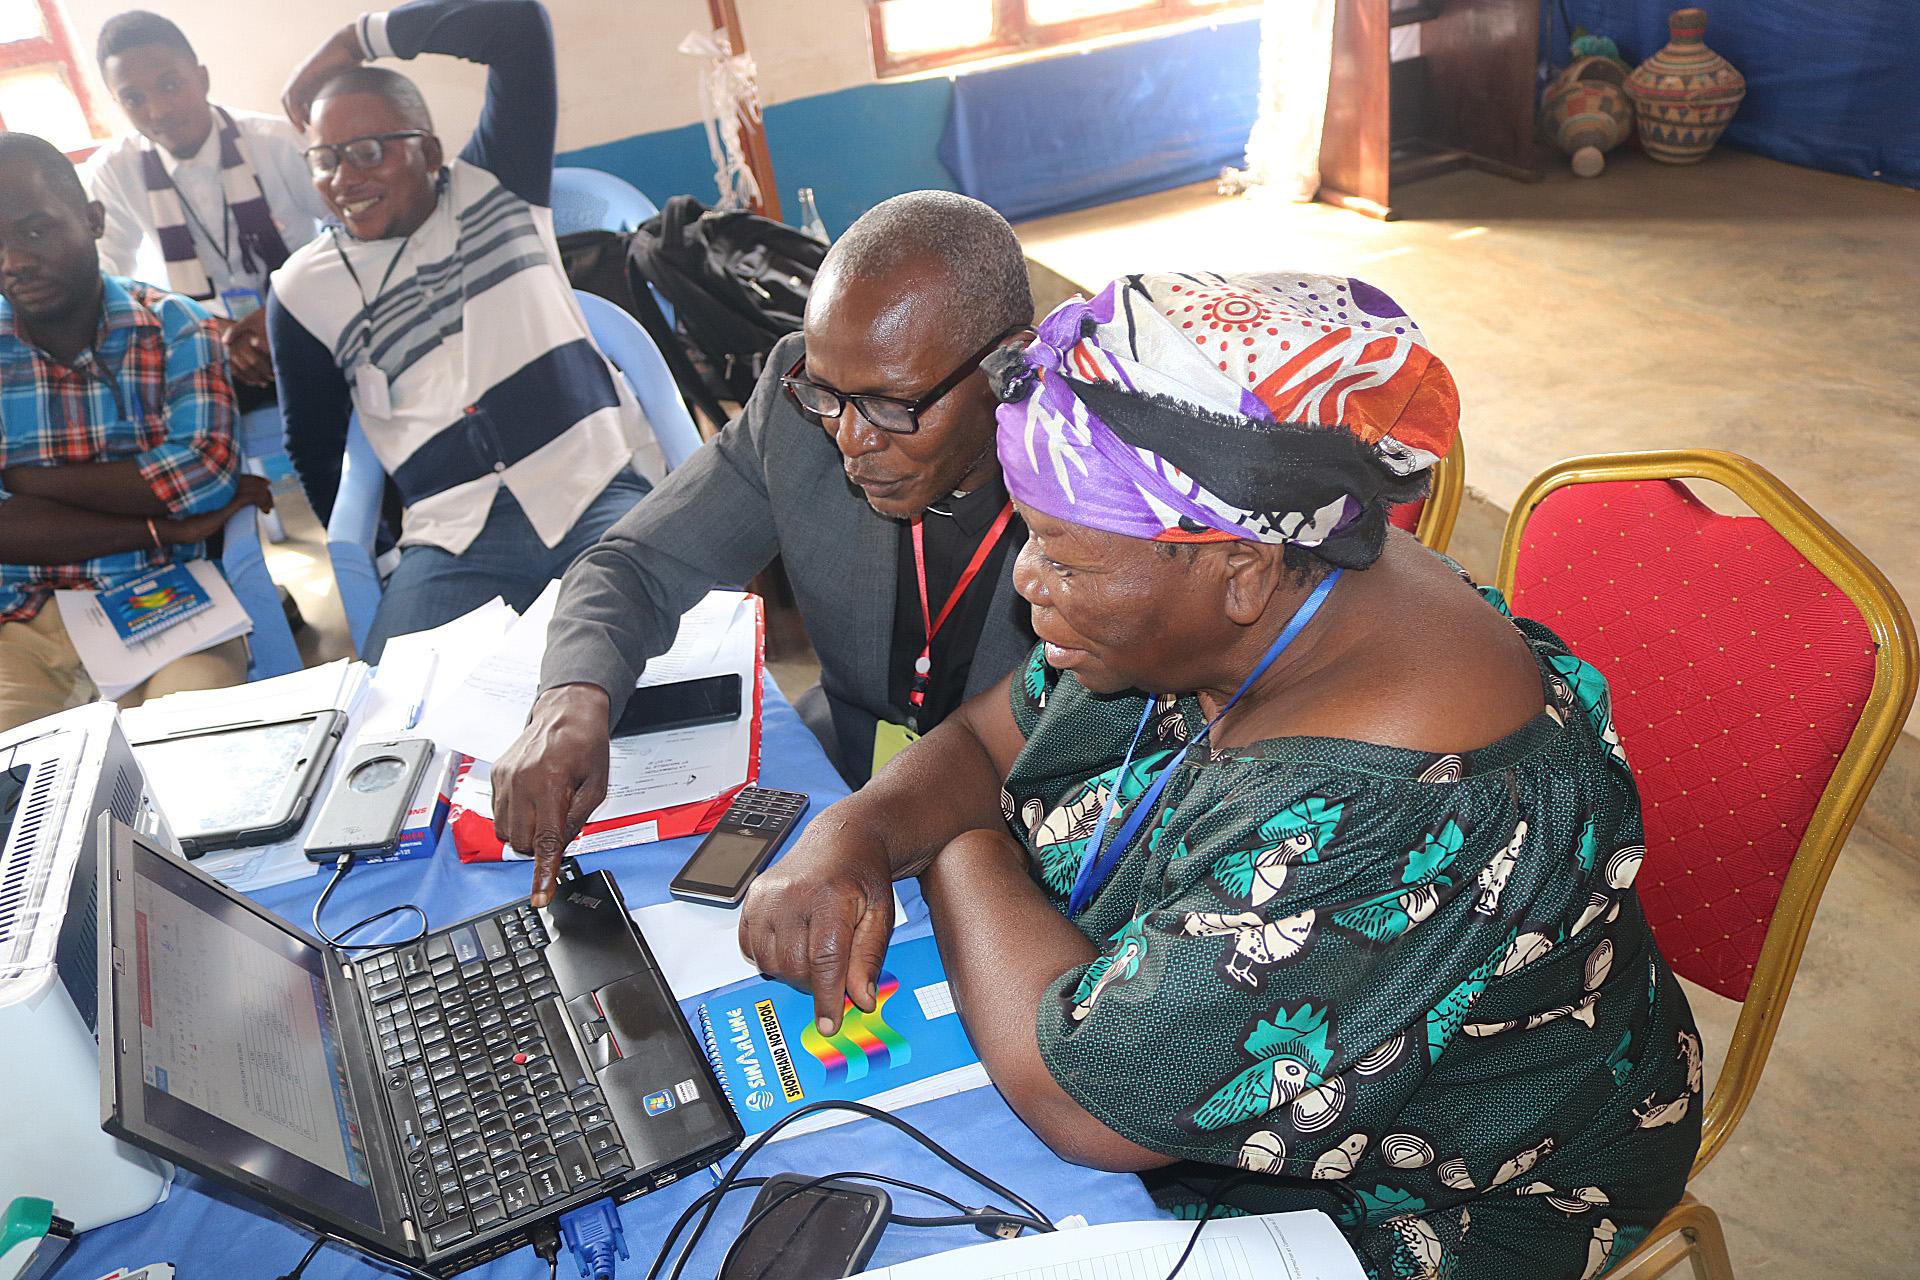 Kito Bonane, vice president of United Methodist Women in Kivu, learns the basics of computer science during technology training in Bukavu, Congo. Photo by Philippe Kituka Lolonga, UMNS.